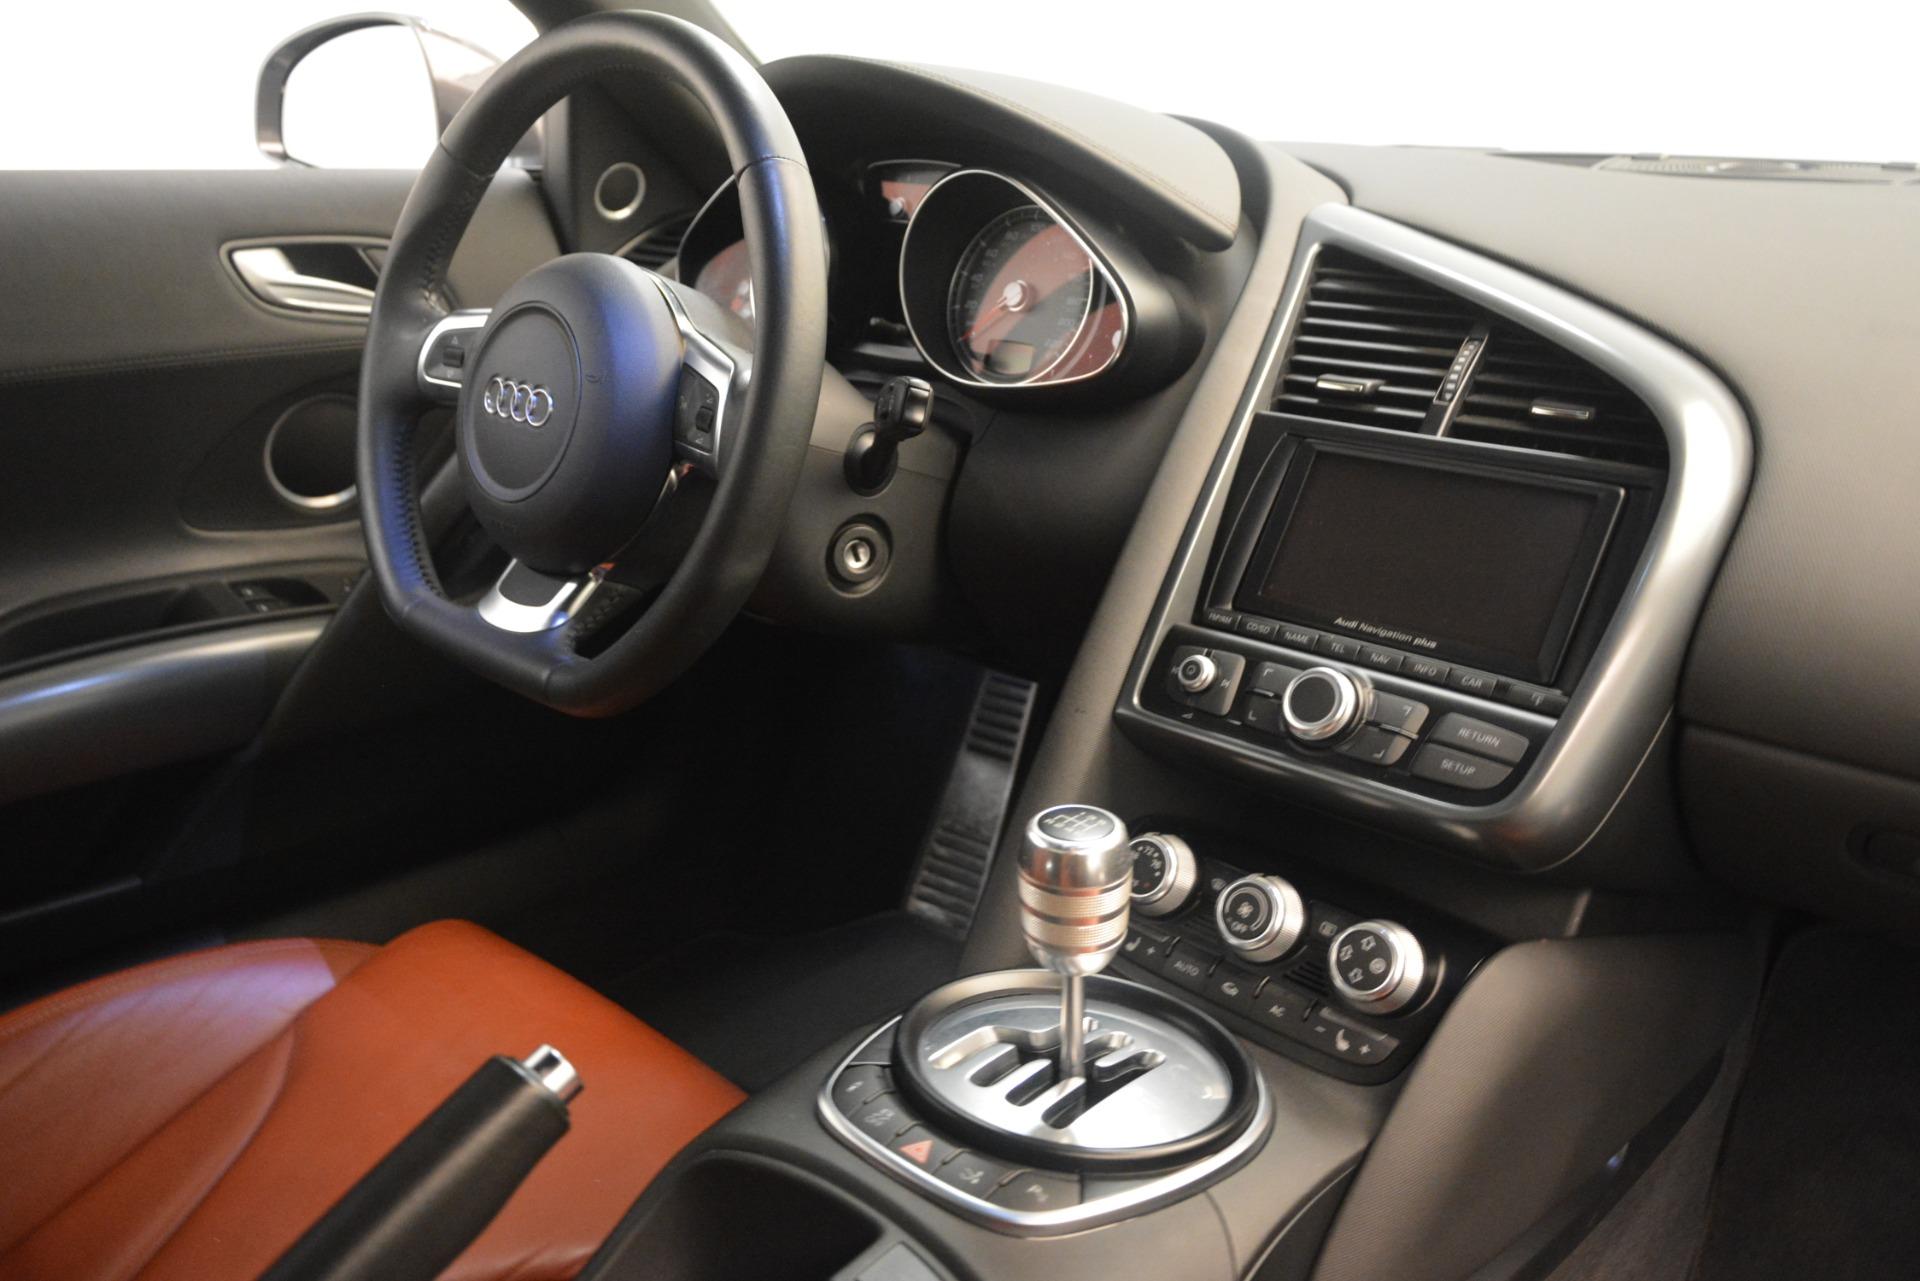 Used 2009 Audi R8 quattro For Sale In Greenwich, CT 3228_p19